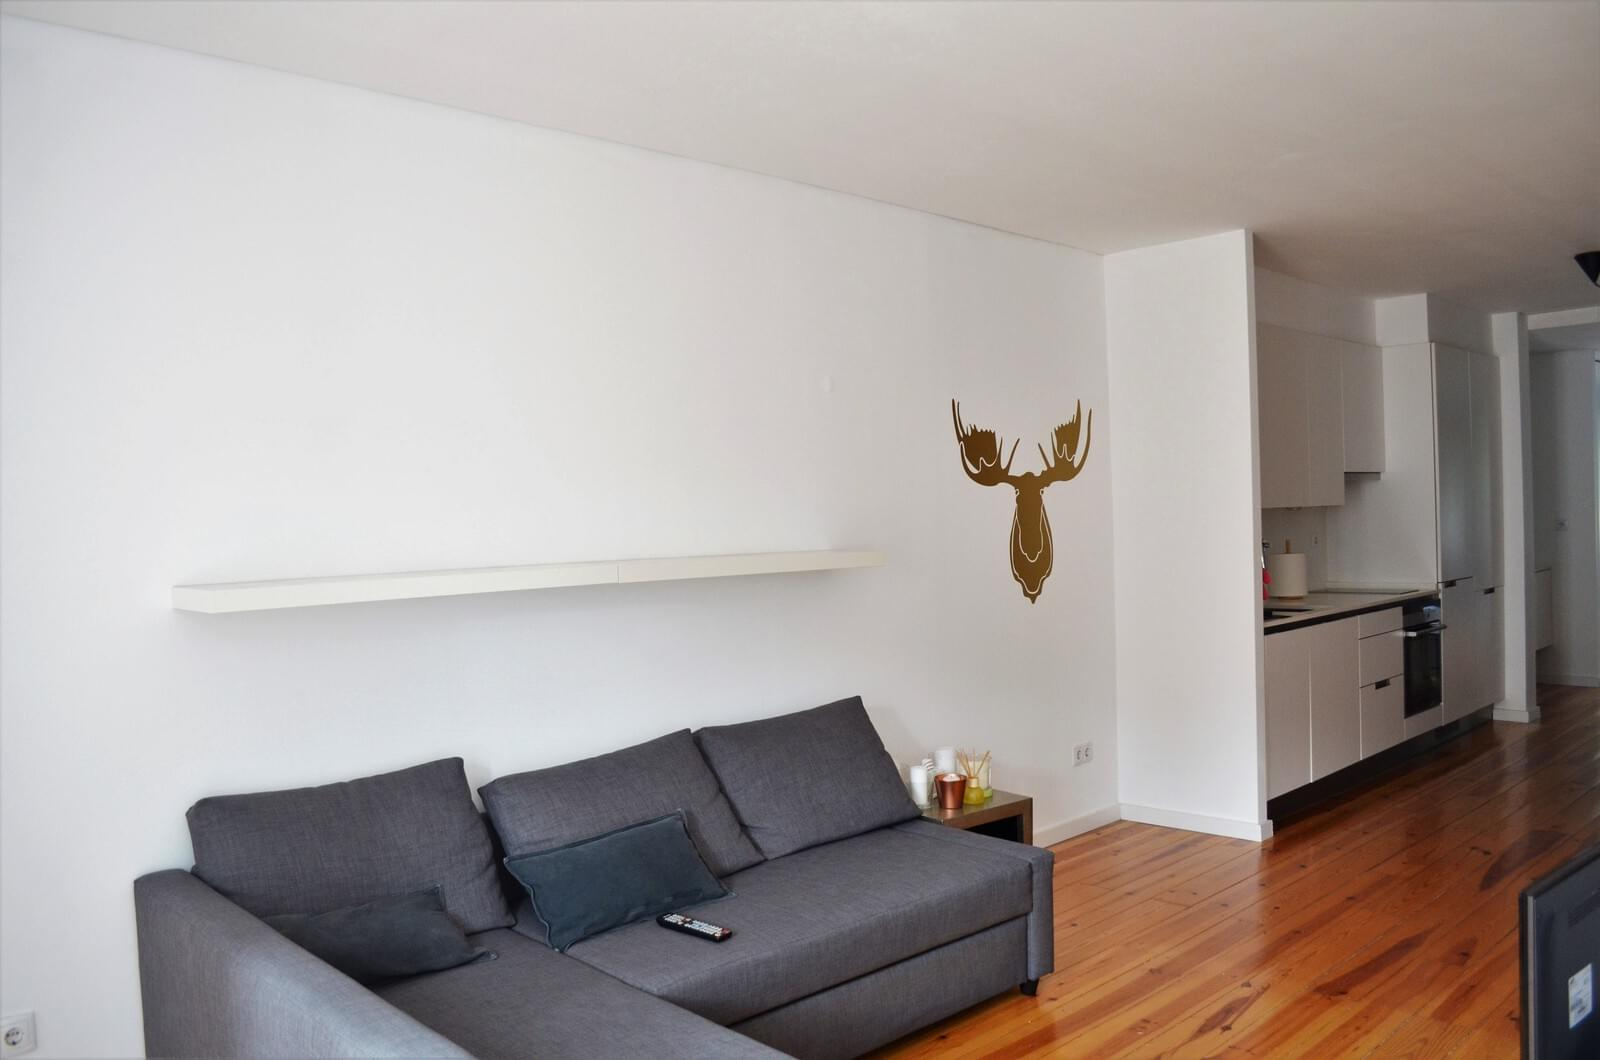 pf17785-apartamento-t1-lisboa-df334c62-c3f1-4b3f-9f81-c8a01906fde9